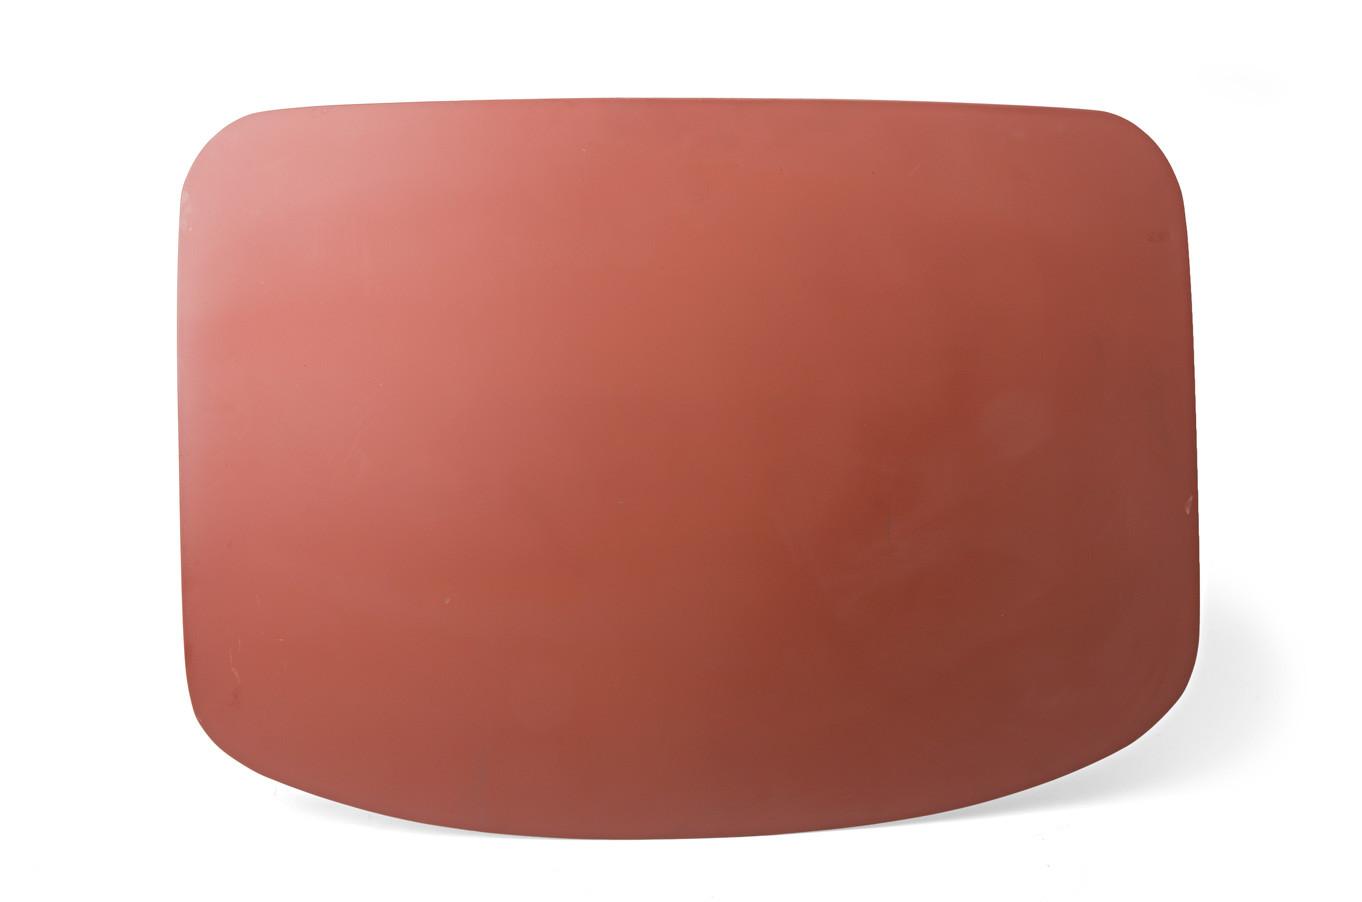 Boot lid